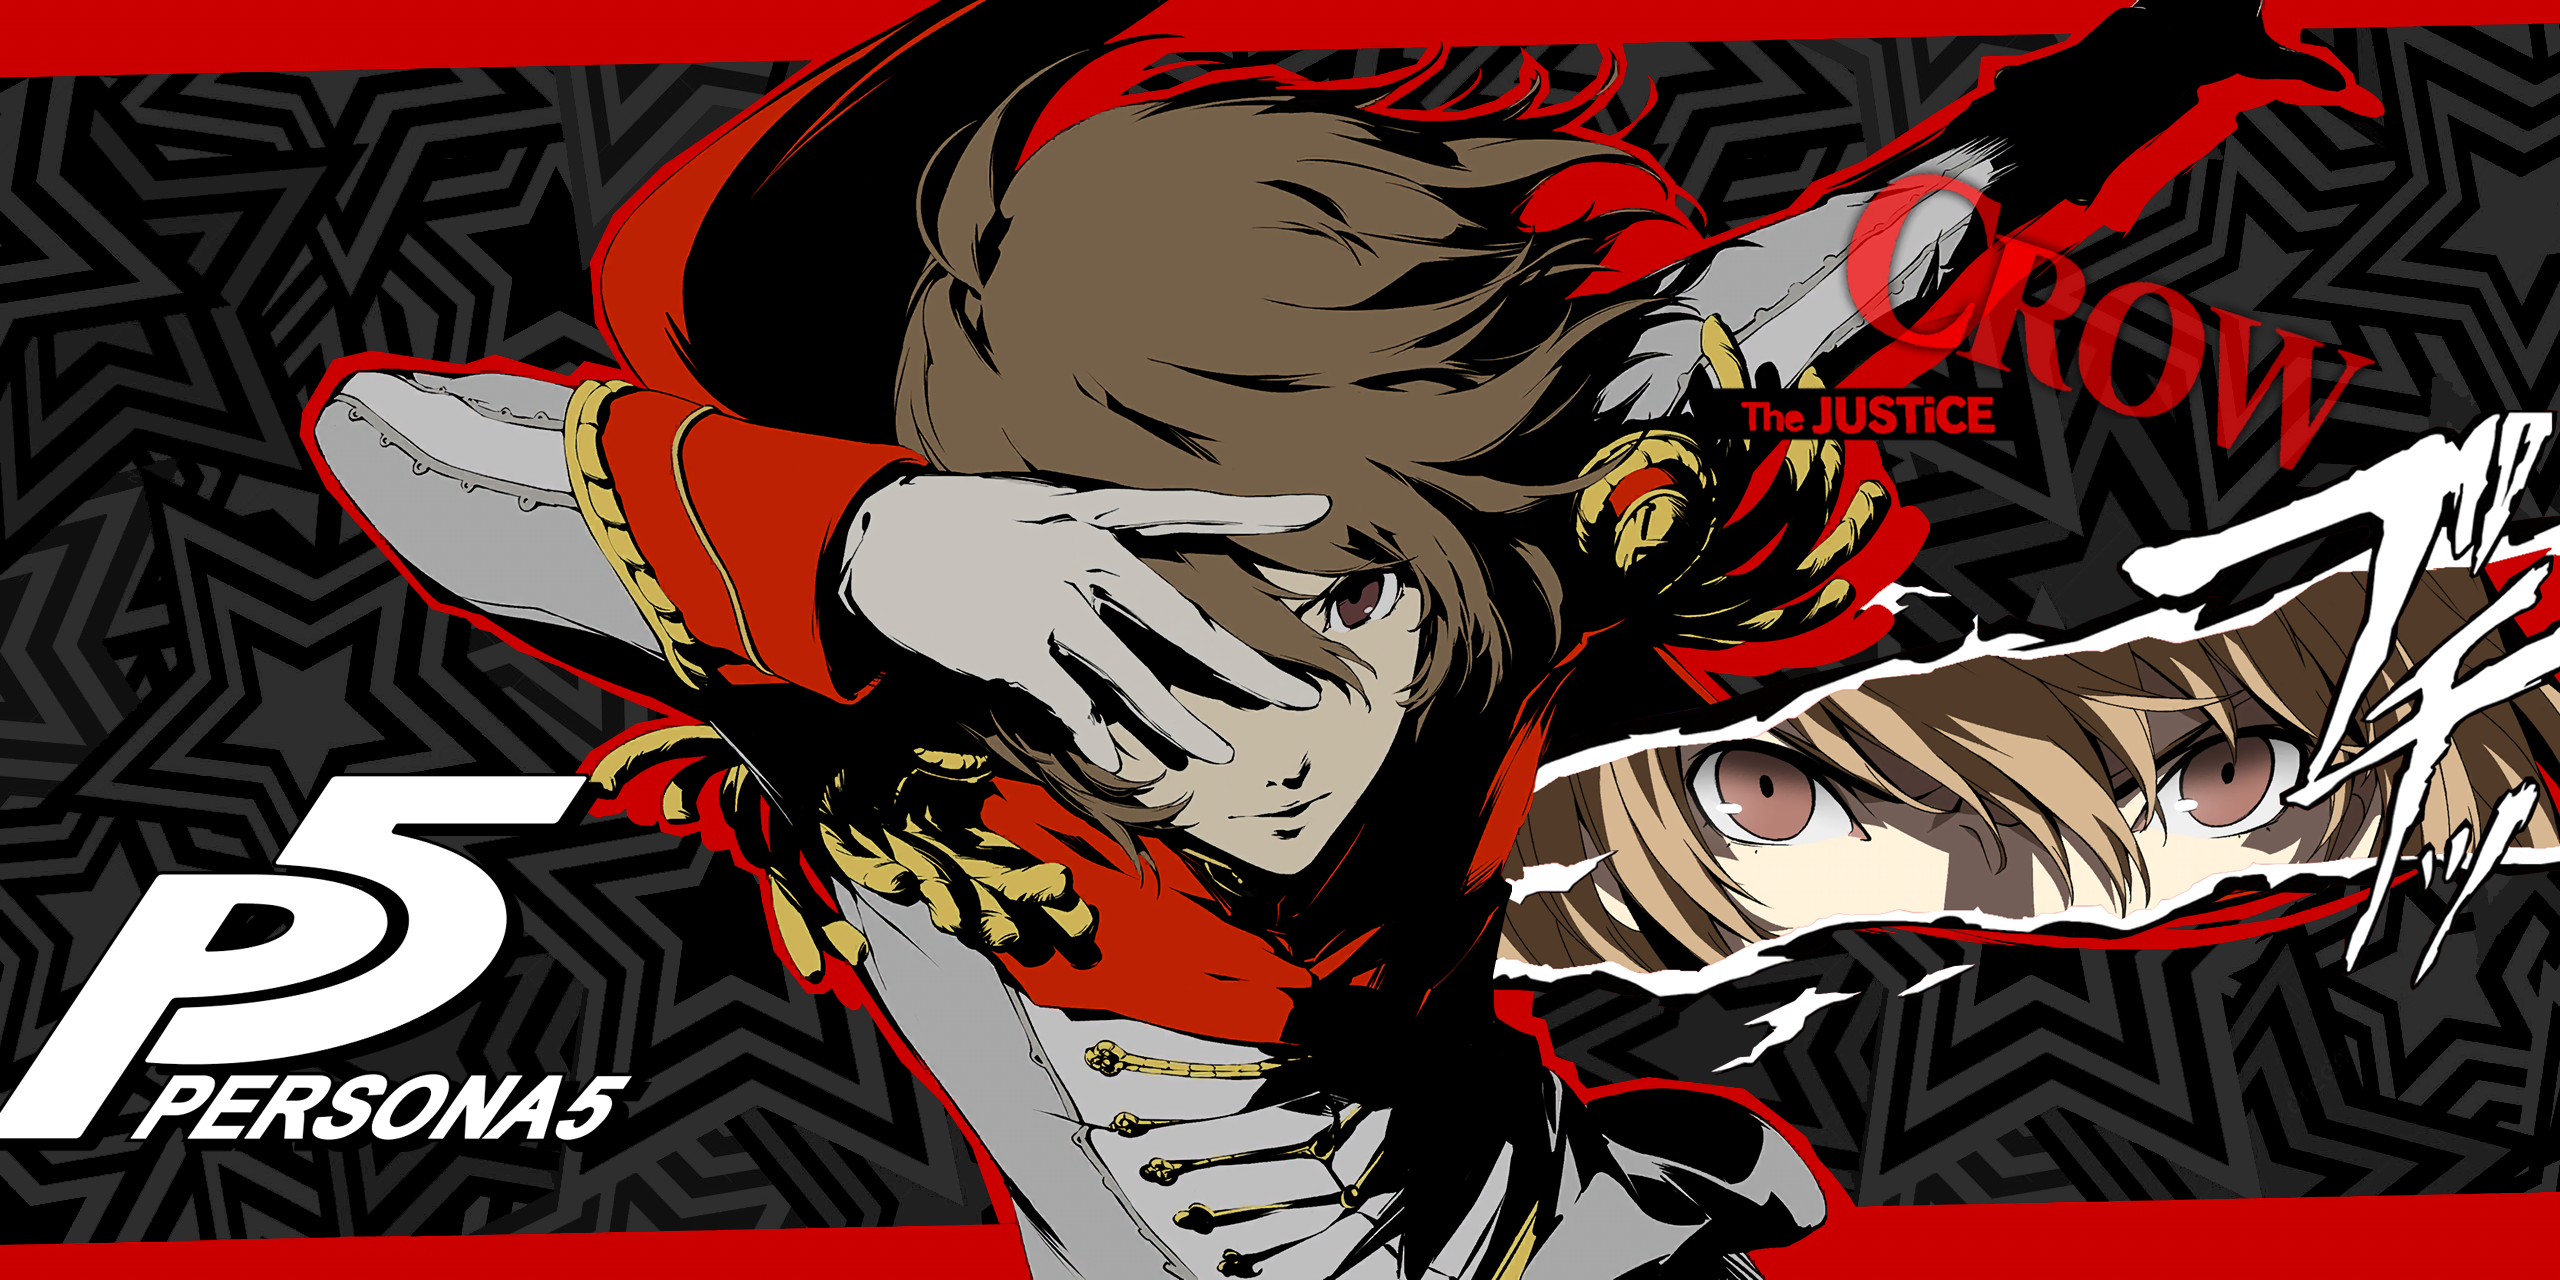 Persona 5 Goro AkechiCrow Persona 5 Persona Persona 5 goro 2560x1280